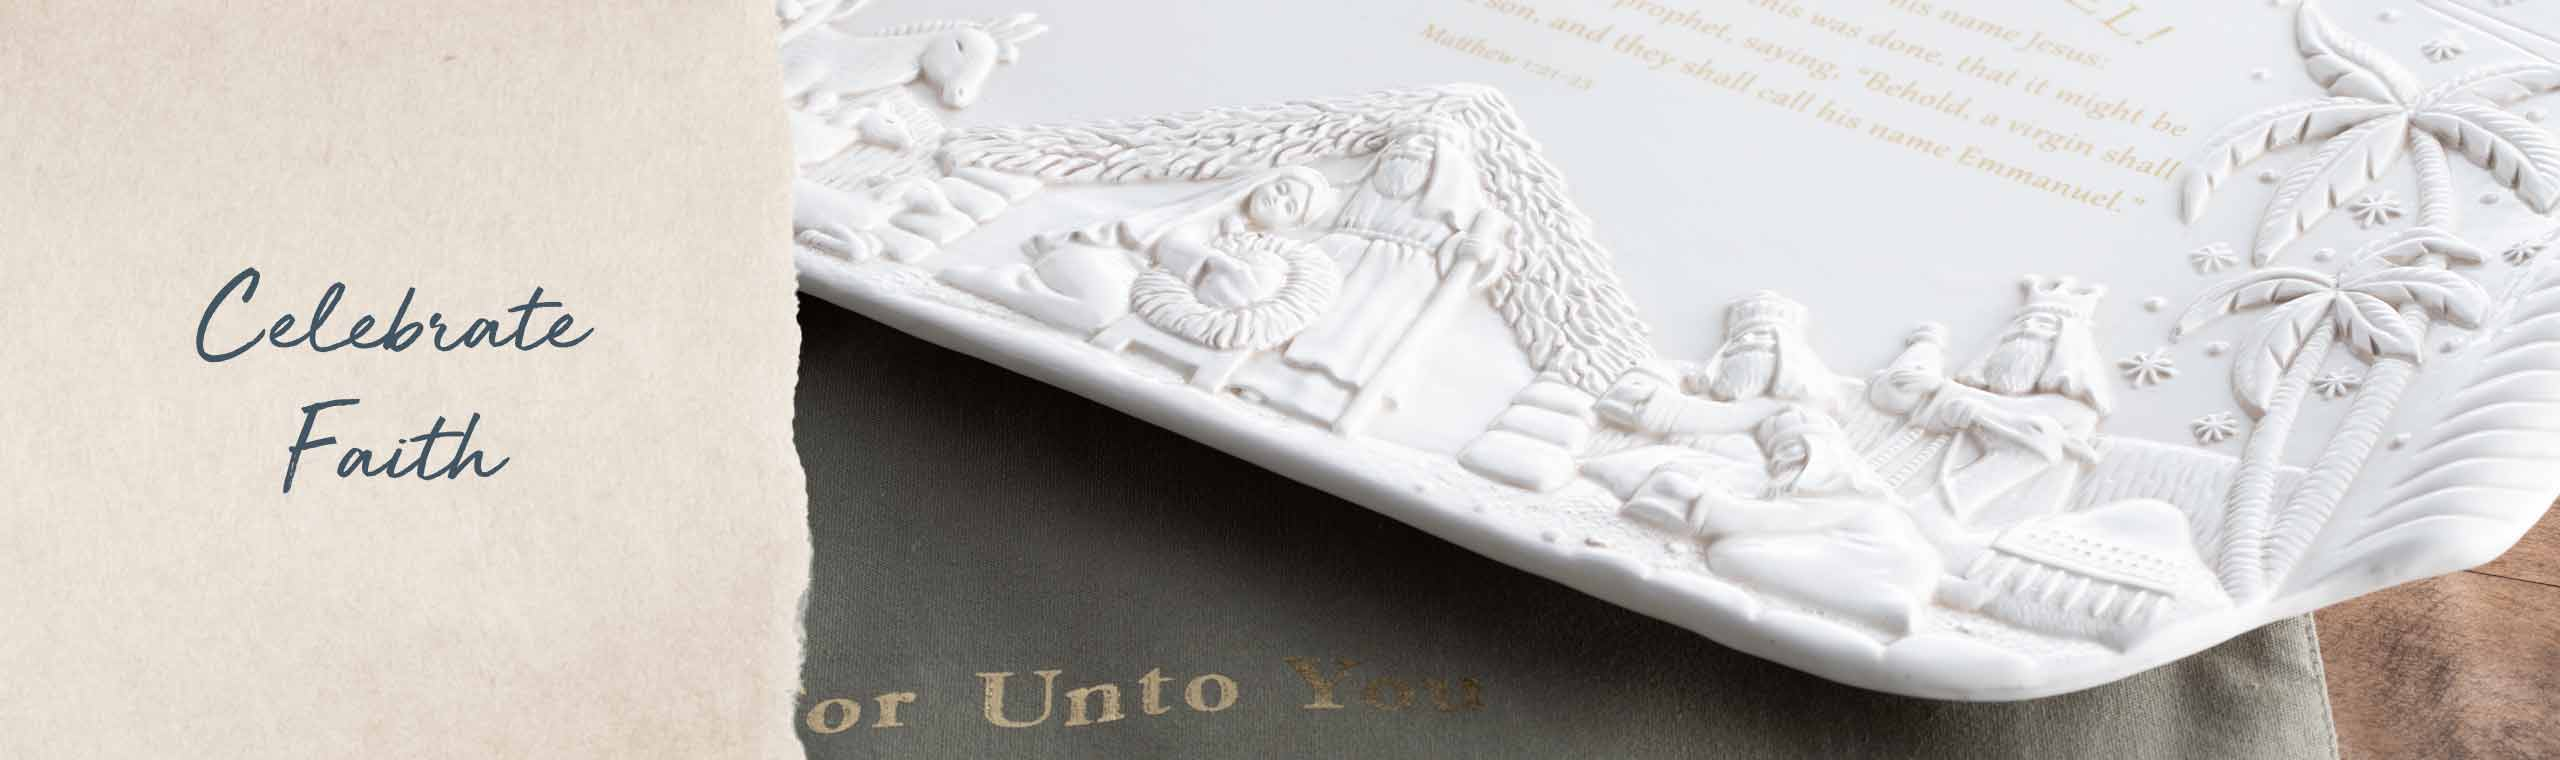 Celebrate Faith. Close up of white ceramic platter depicting Joseph, Mary and Baby Jesus nativity scene.